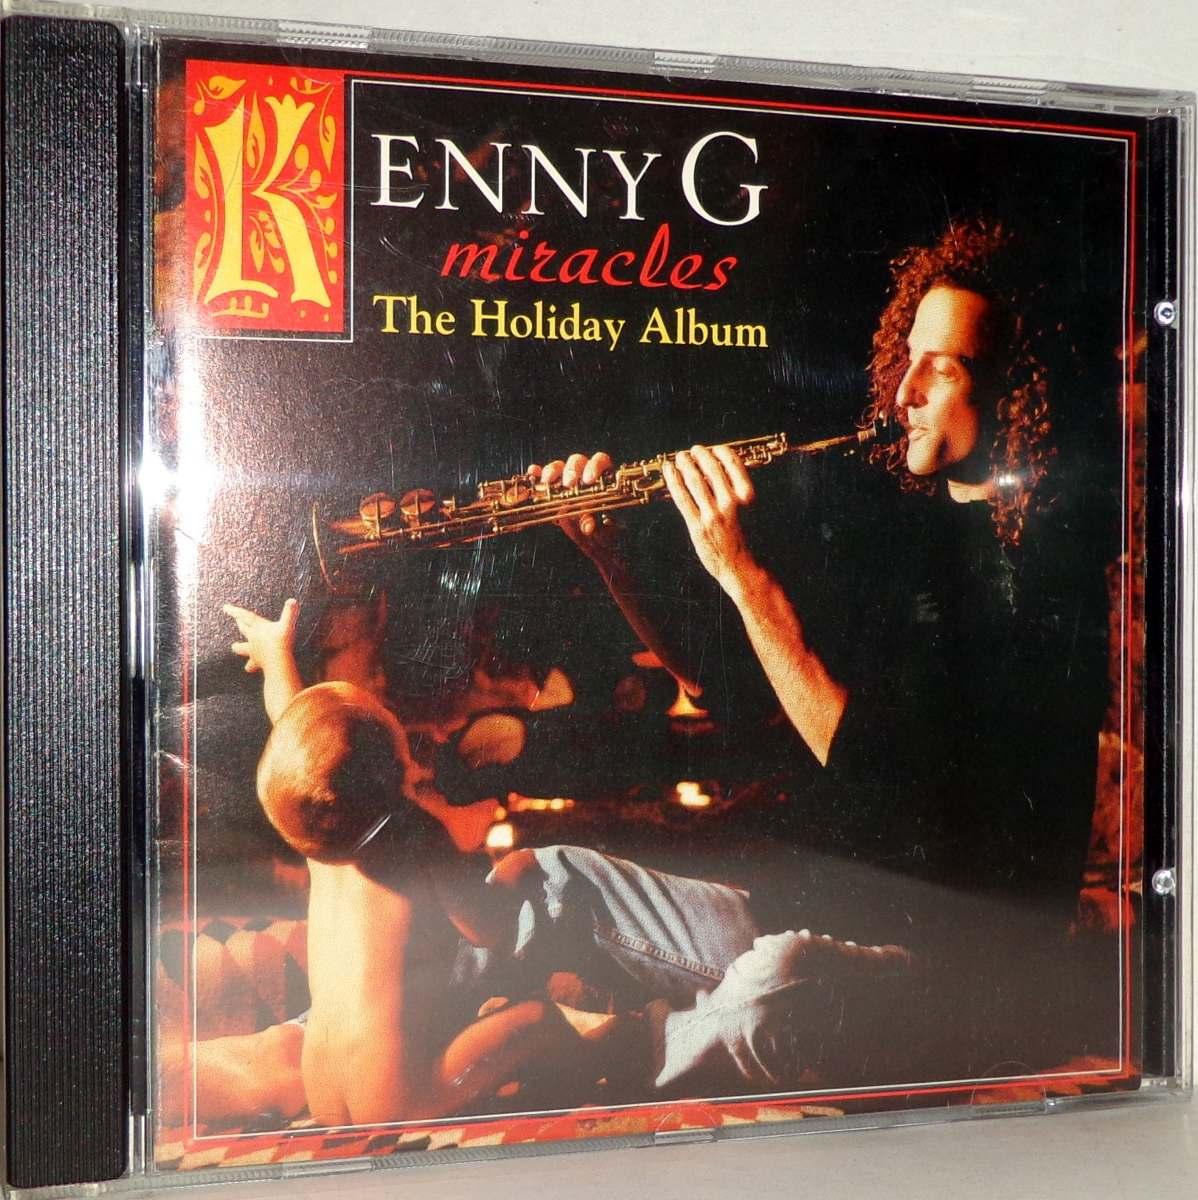 Cd Kenny G - Miracles - The Holiday Album - R$ 18,90 em Mercado Livre